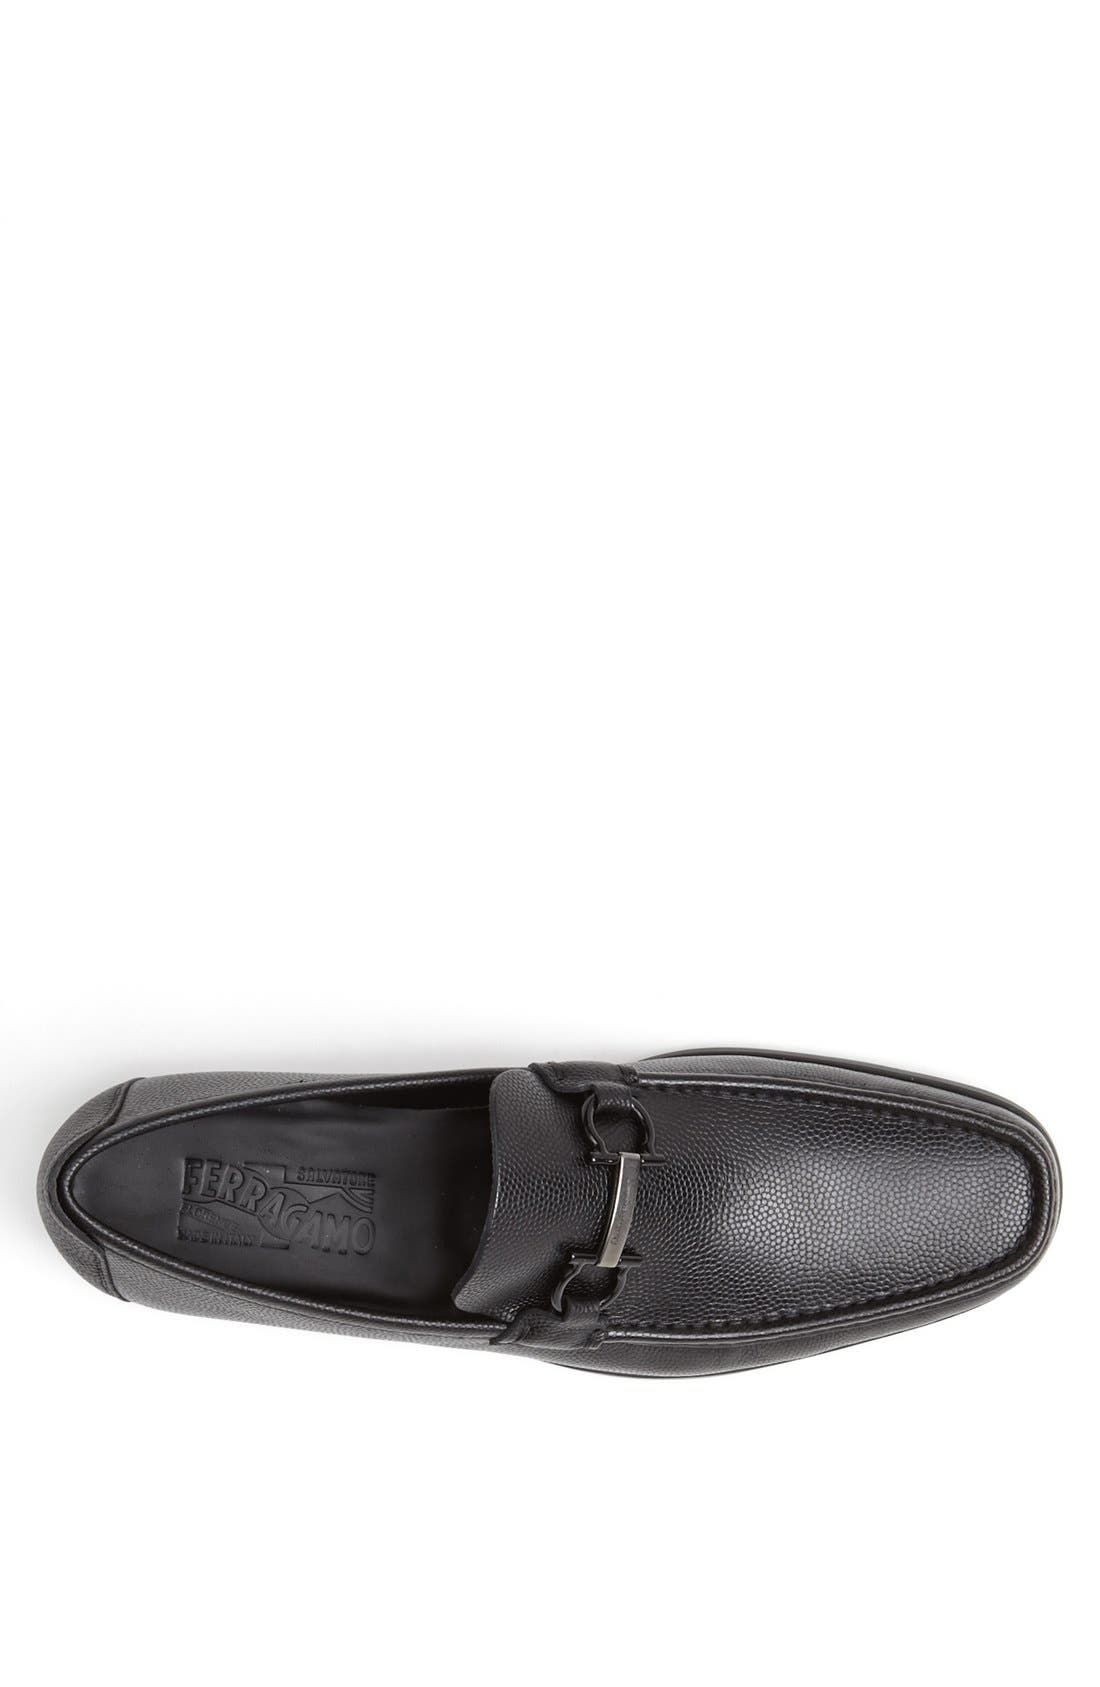 'Regal' Pebbled Leather Loafer,                             Alternate thumbnail 5, color,                             001